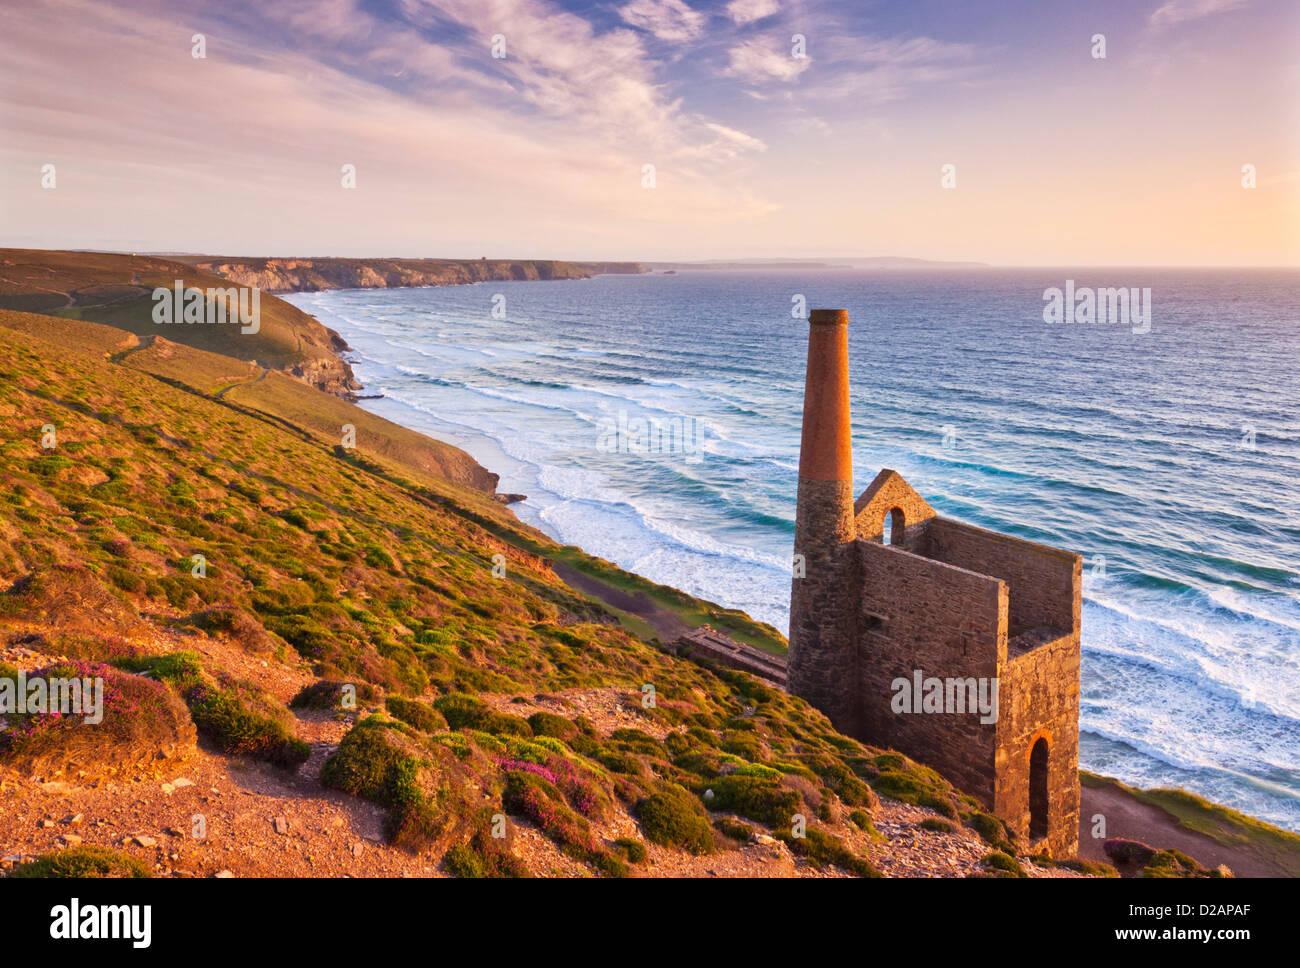 Wheal Coates cornish tin mine near St Agnes North Cornwall coast England GB UK EU Europe - Stock Image